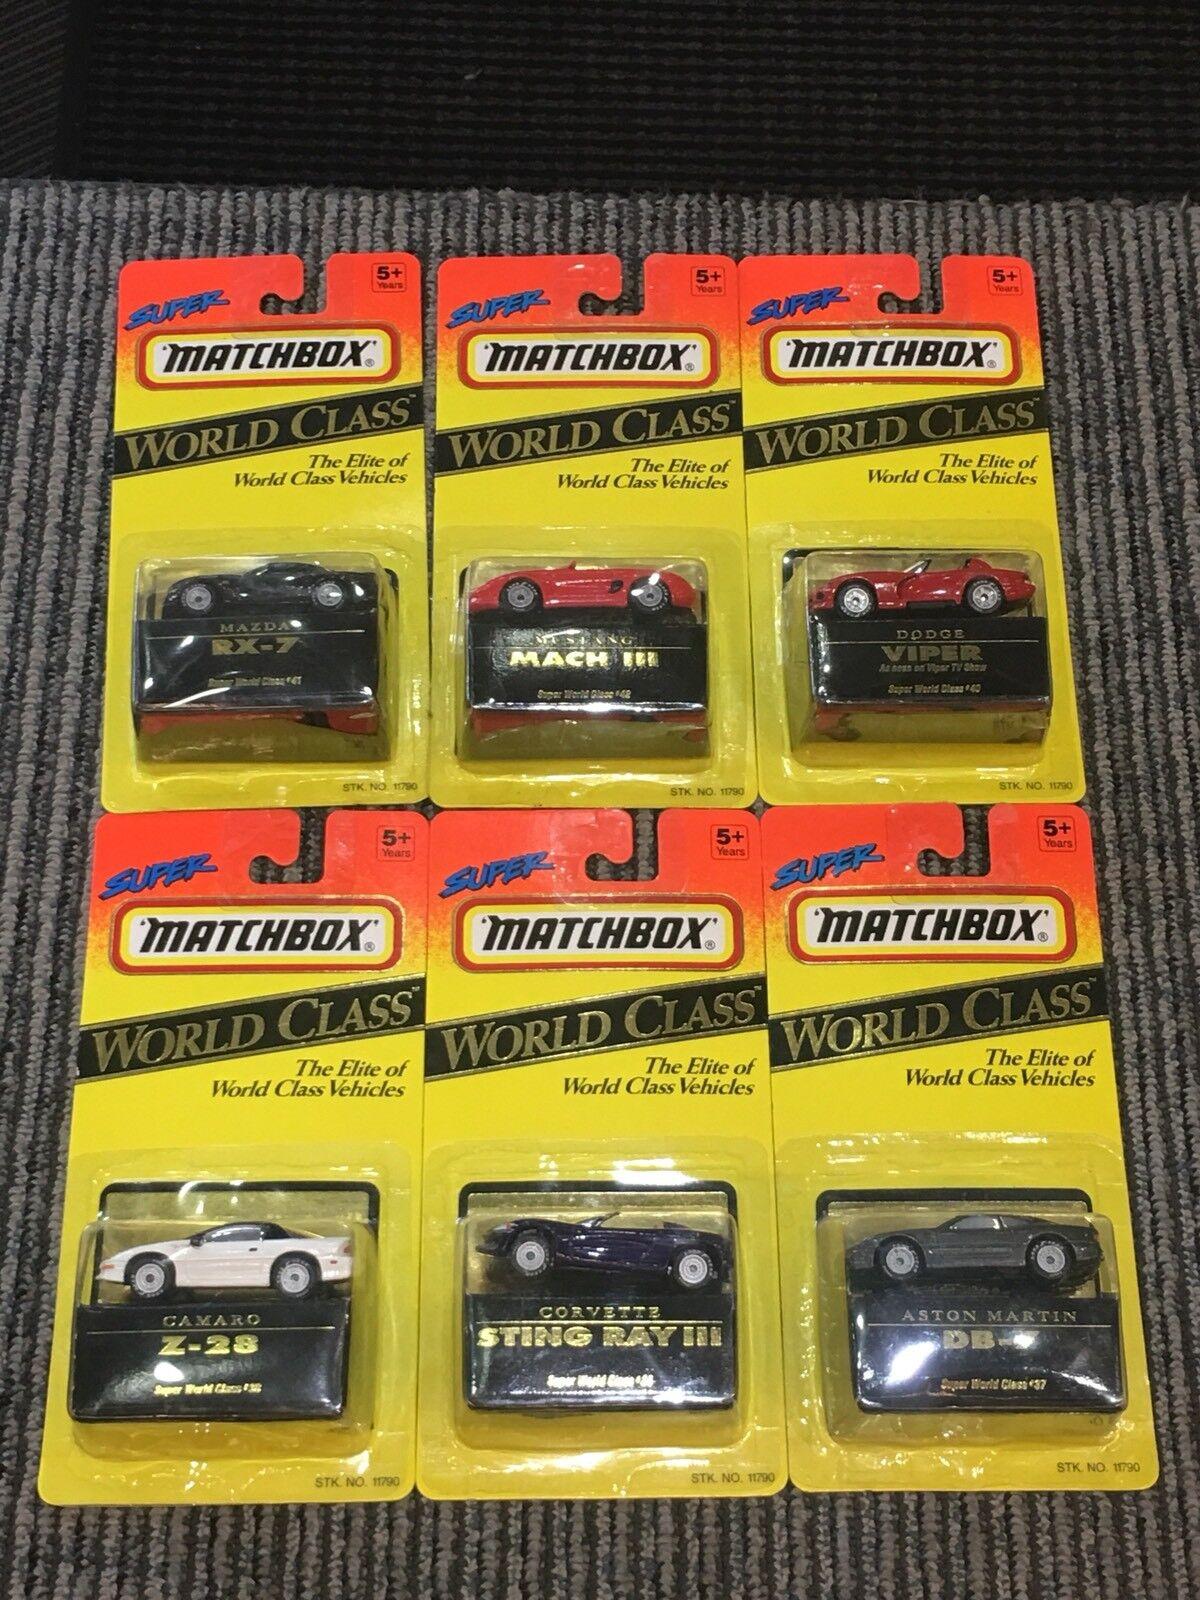 Neuf dans sa boîte Lot de 6 Matchbox Super Classe Mondiale complet 11790 Viper, Camaro, Mazda etc.